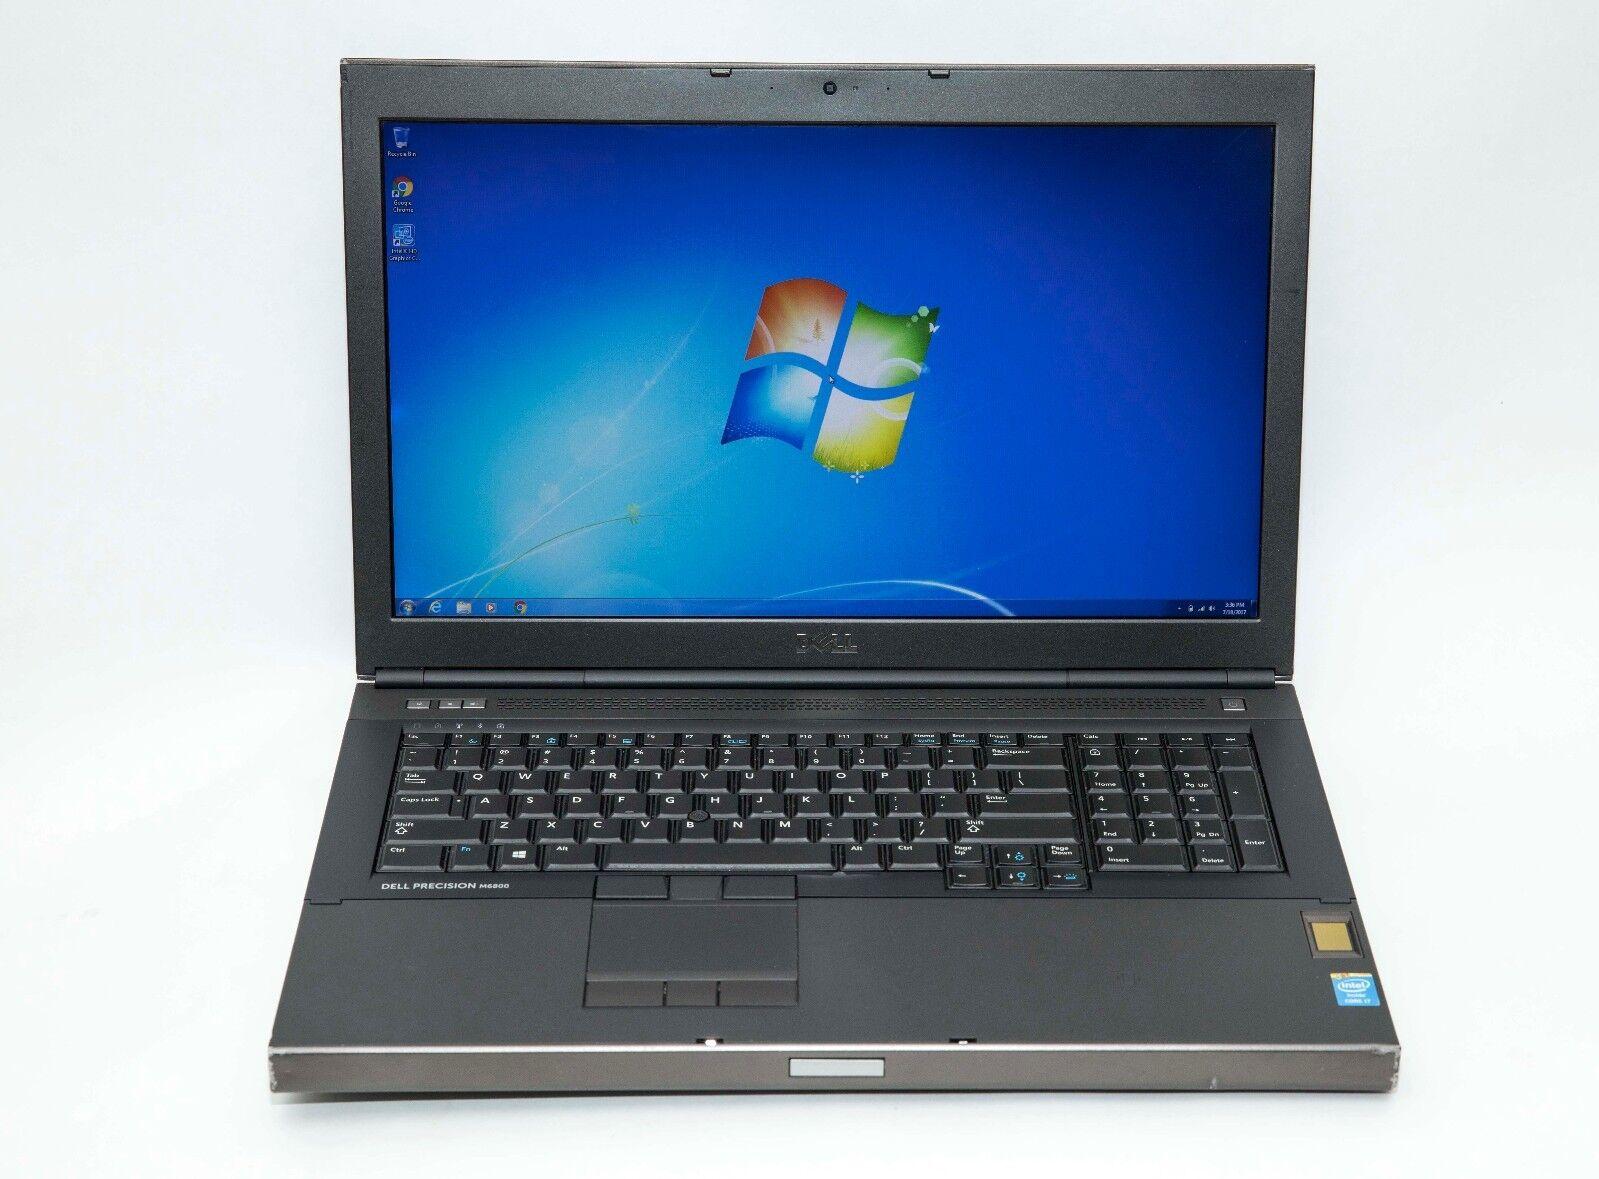 Dell Precision M6800 i7-4800MQ 2.7GHz 8GB 256GB SSD Wn7 NVidia 4GB Gaming Laptop